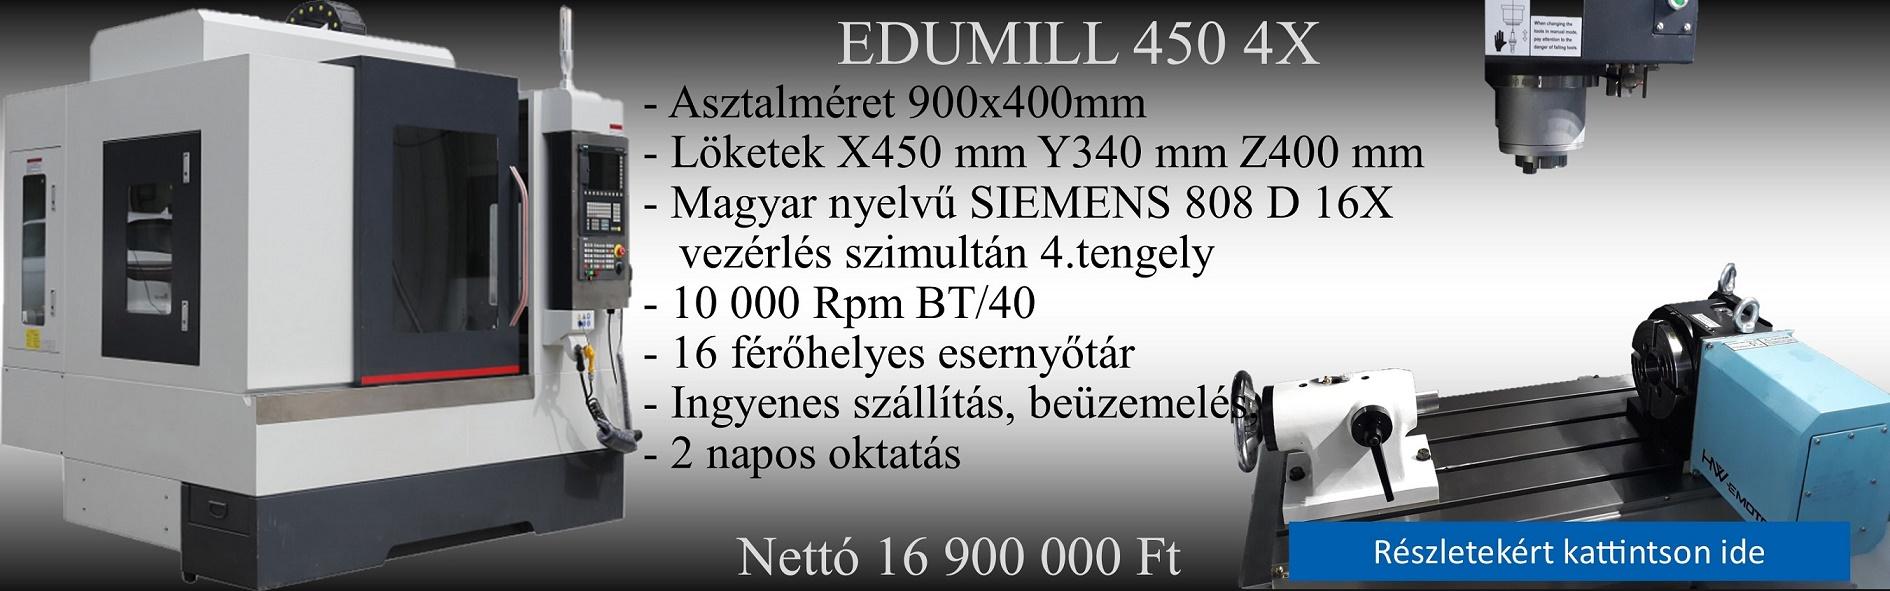 EDUMILL 450